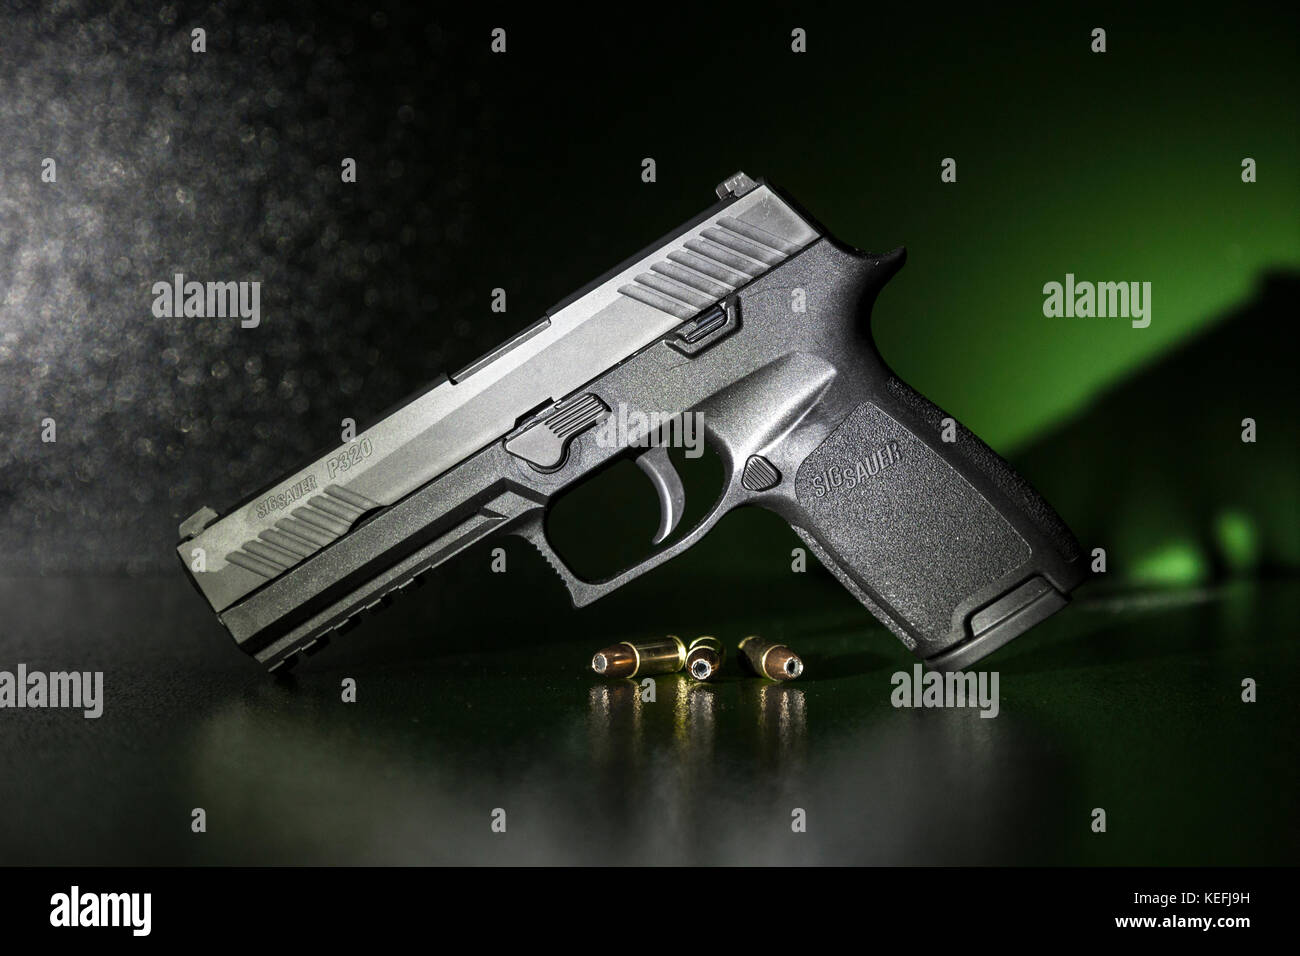 Pistola sig sauer p320 full-size 9mm Immagini Stock